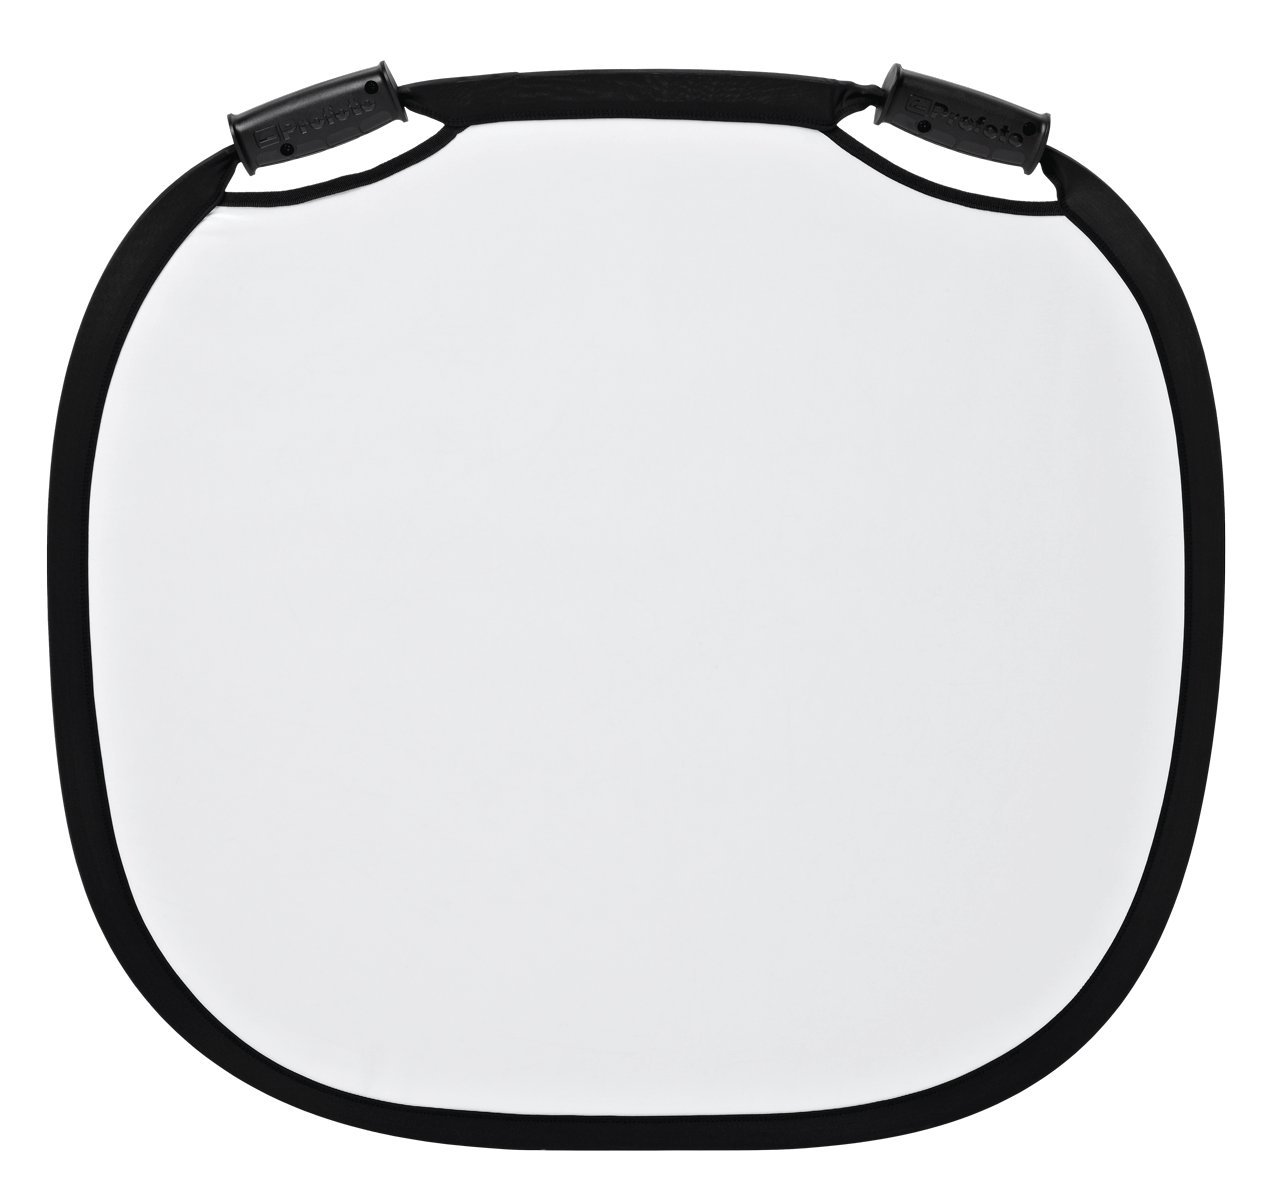 Profoto Medium Reflector - Silver/White by Profoto Reflectors (Image #2)